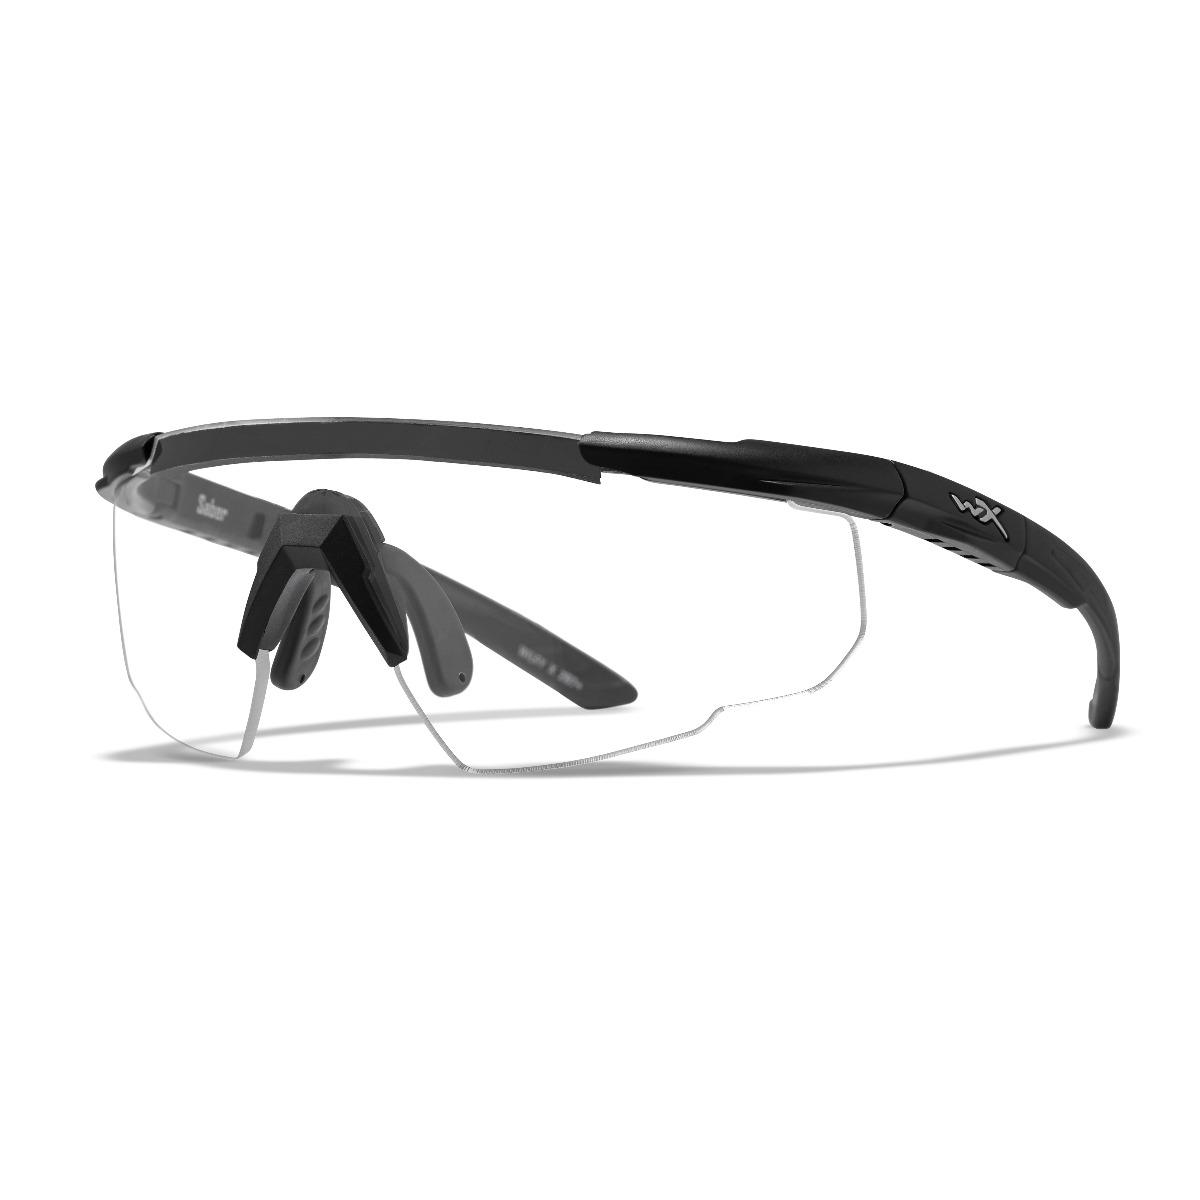 WILEY X Saber Advanced Sunglasses - Clear Lens / Matte Black Frame